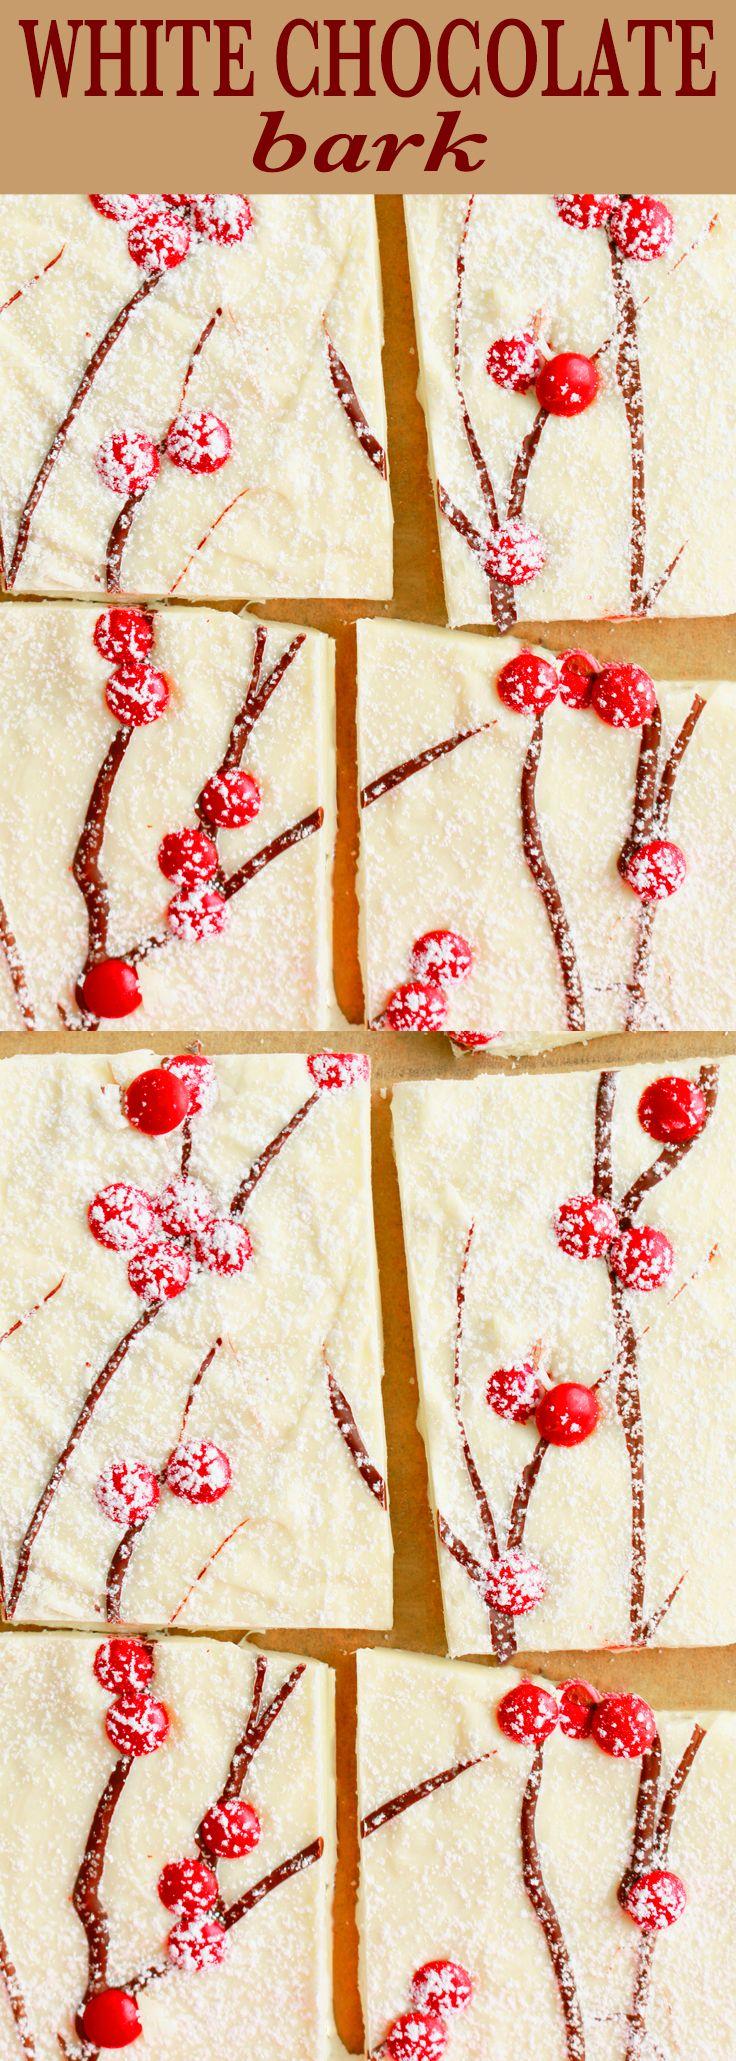 Homemade candy | christmas bark | holiday bark | homemade gift | easy candy | white chocolate bark | christmas treats | holiday recipes | christmas recipes